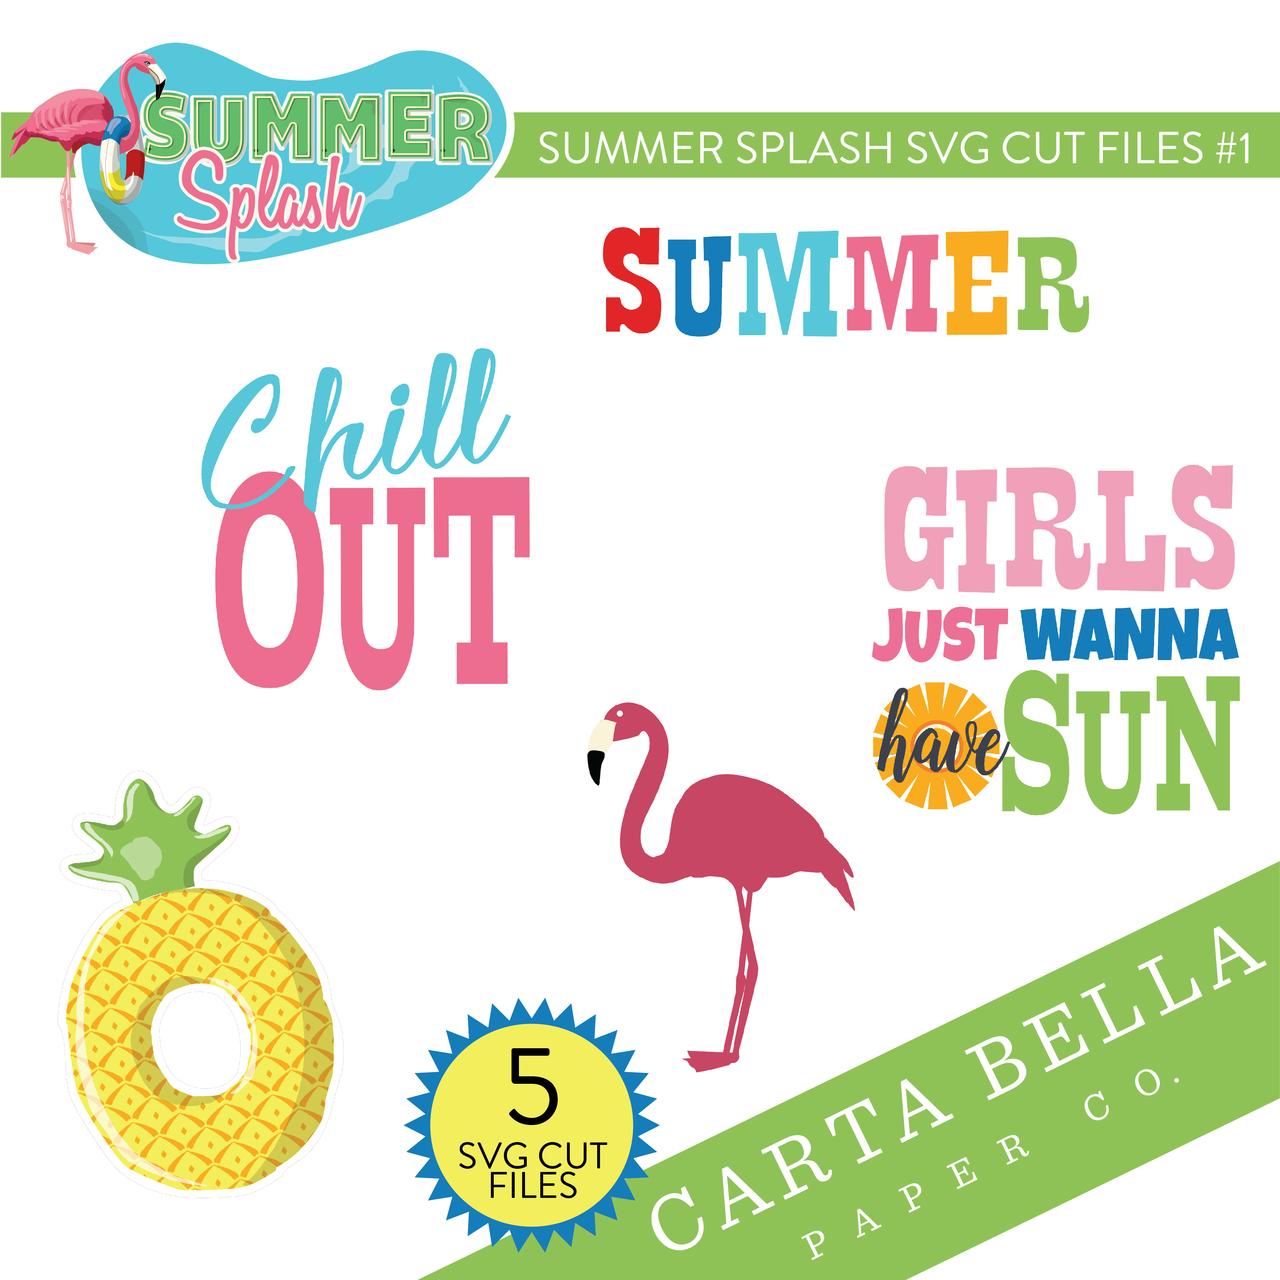 Summer Splash SVG Cut Files #1